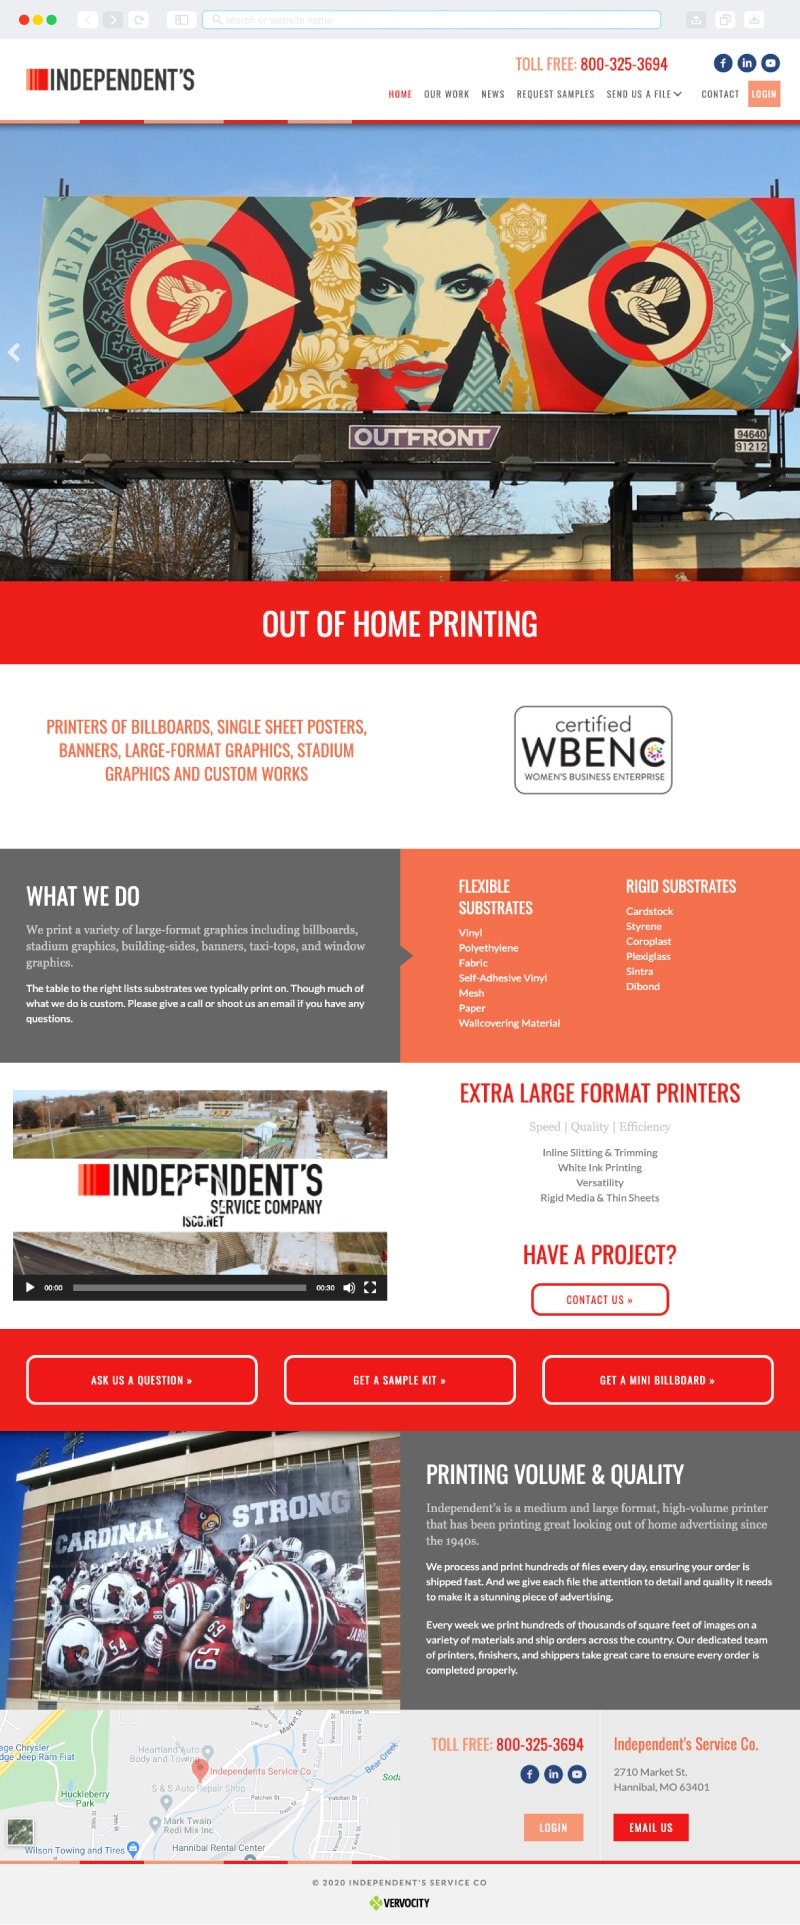 ISCO Homepage | Vervocity